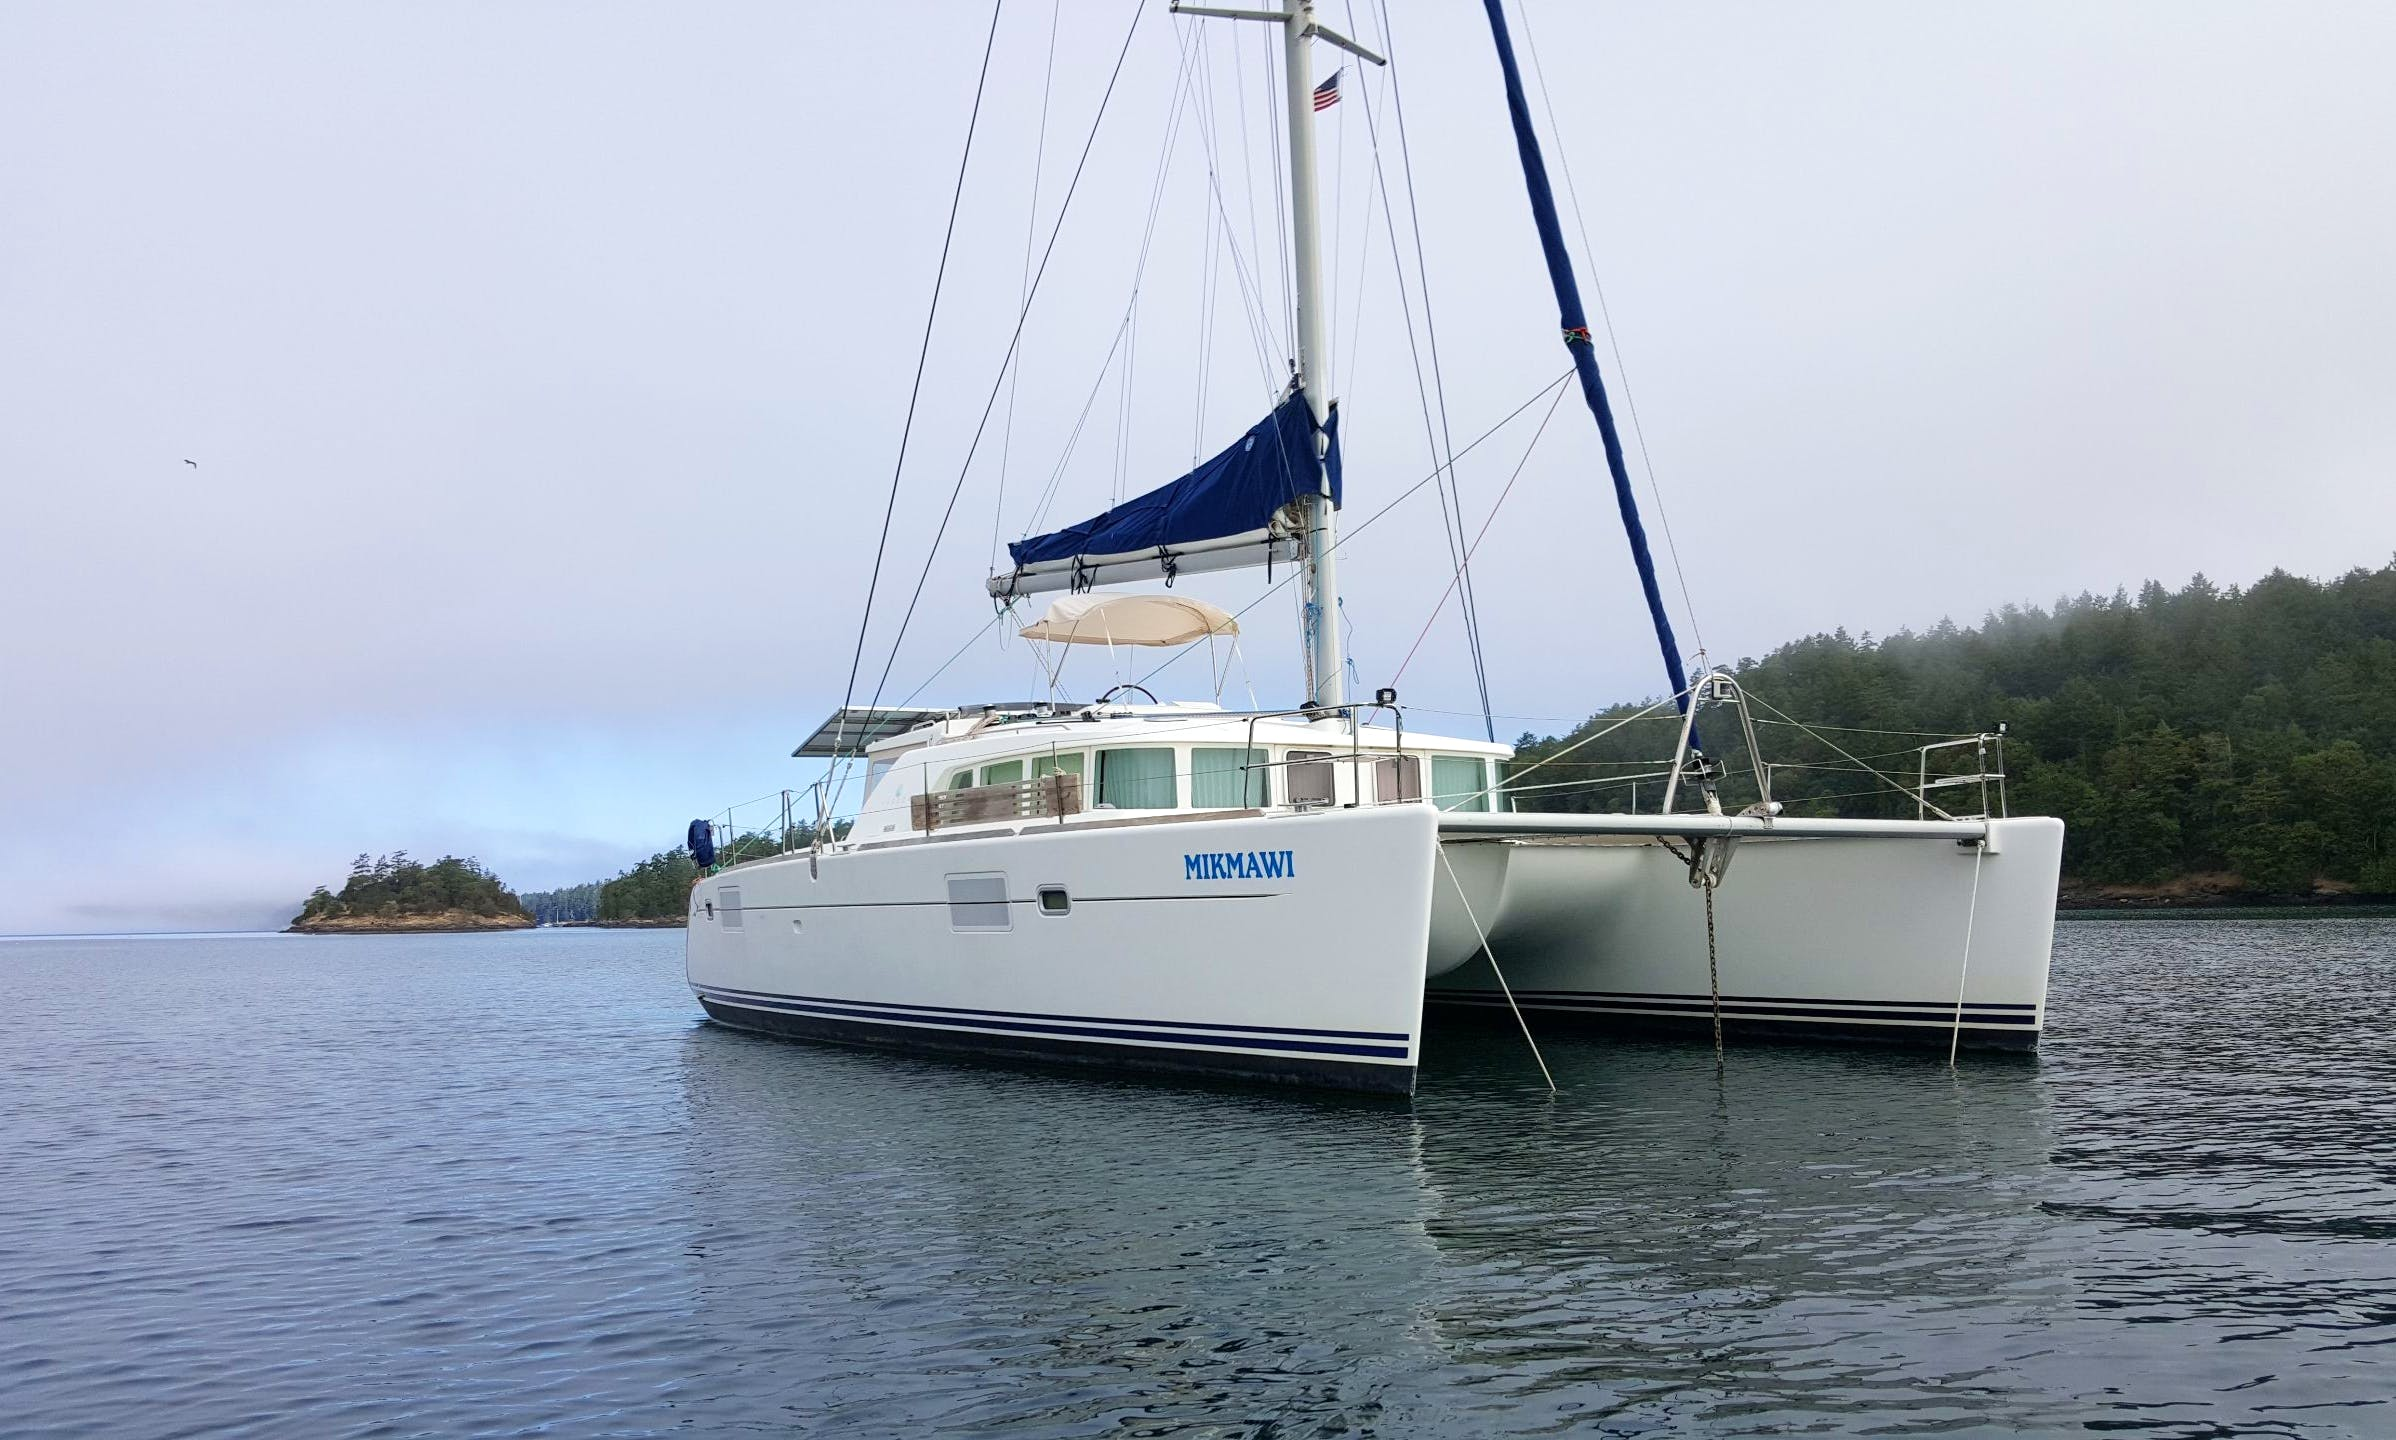 MIKMAWI CHARTERS, Cruising Catamaran rental in Seattle, Wa.